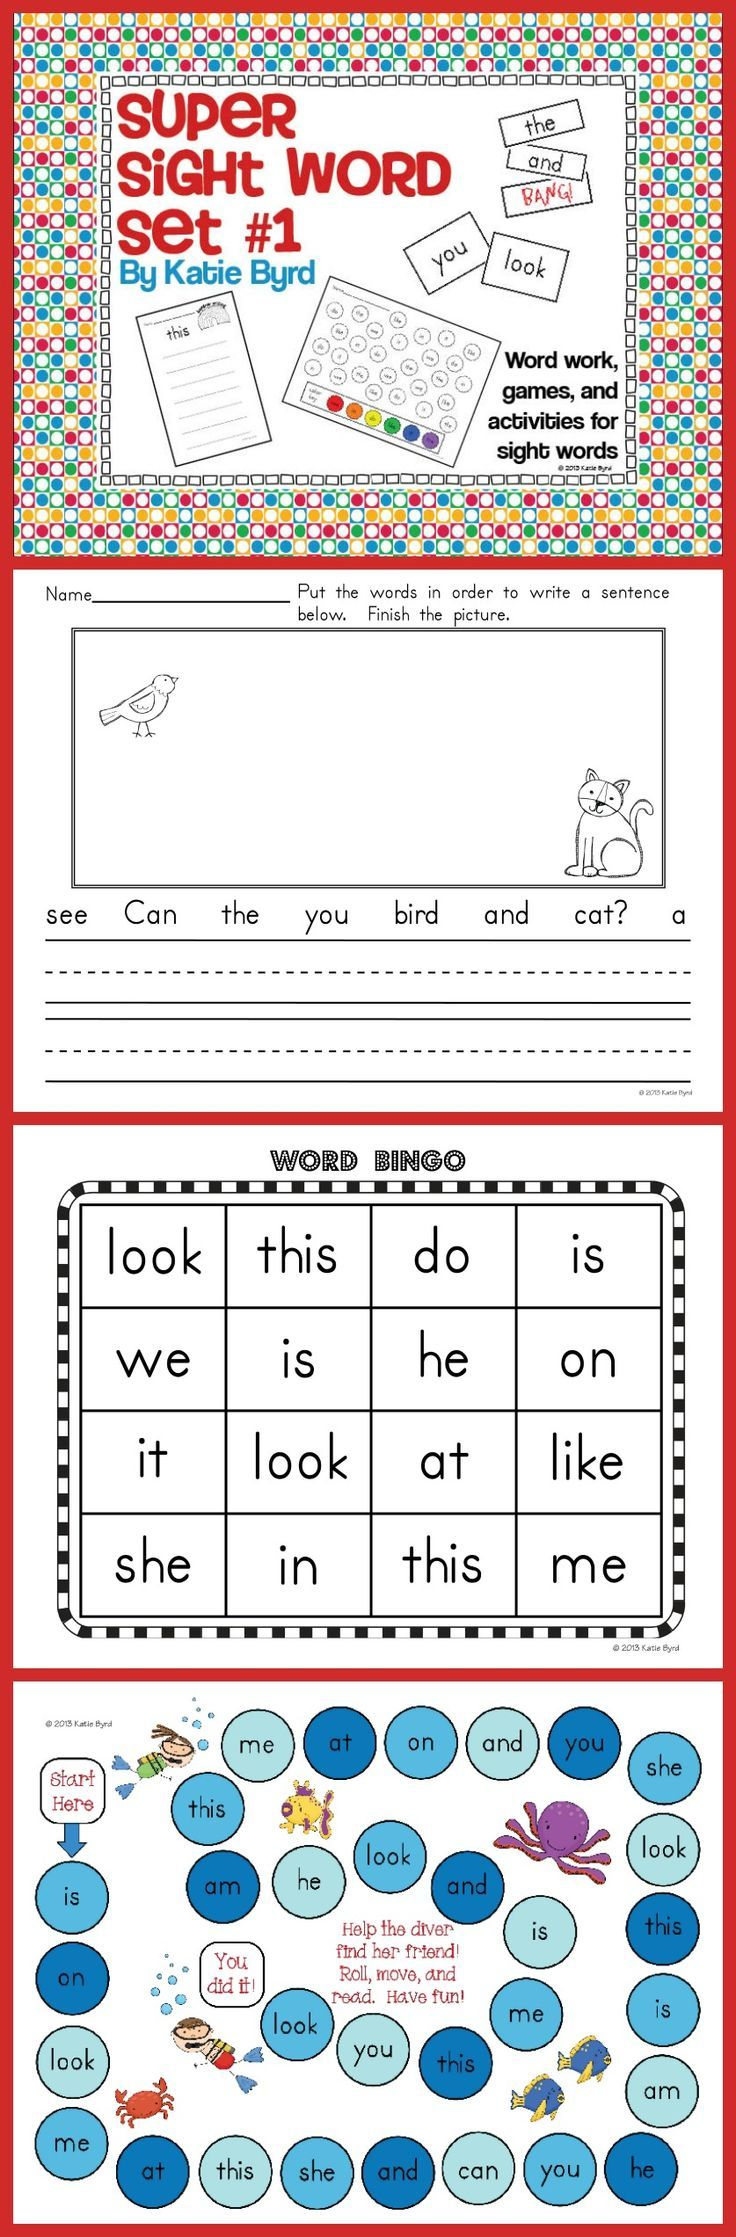 Worksheet Sight Word Program 17 best ideas about word program on pinterest kindergarten sight games words and reading